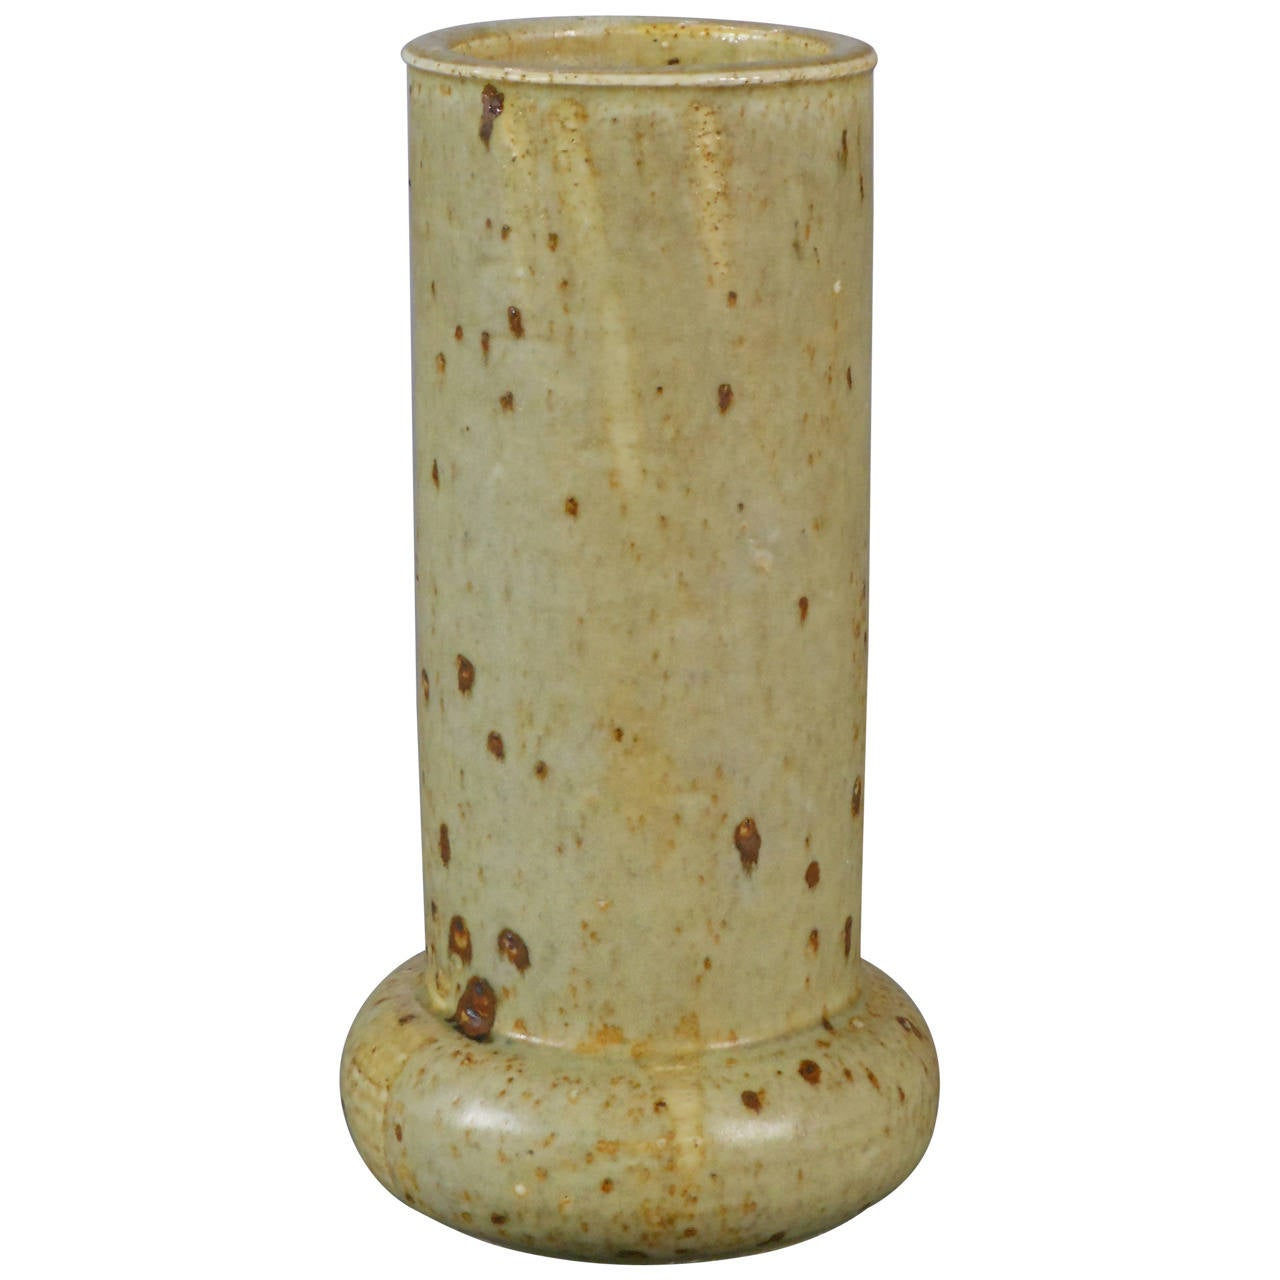 Scandinavian Modern Ceramic Vase by Marianne Westman for Rorstrand